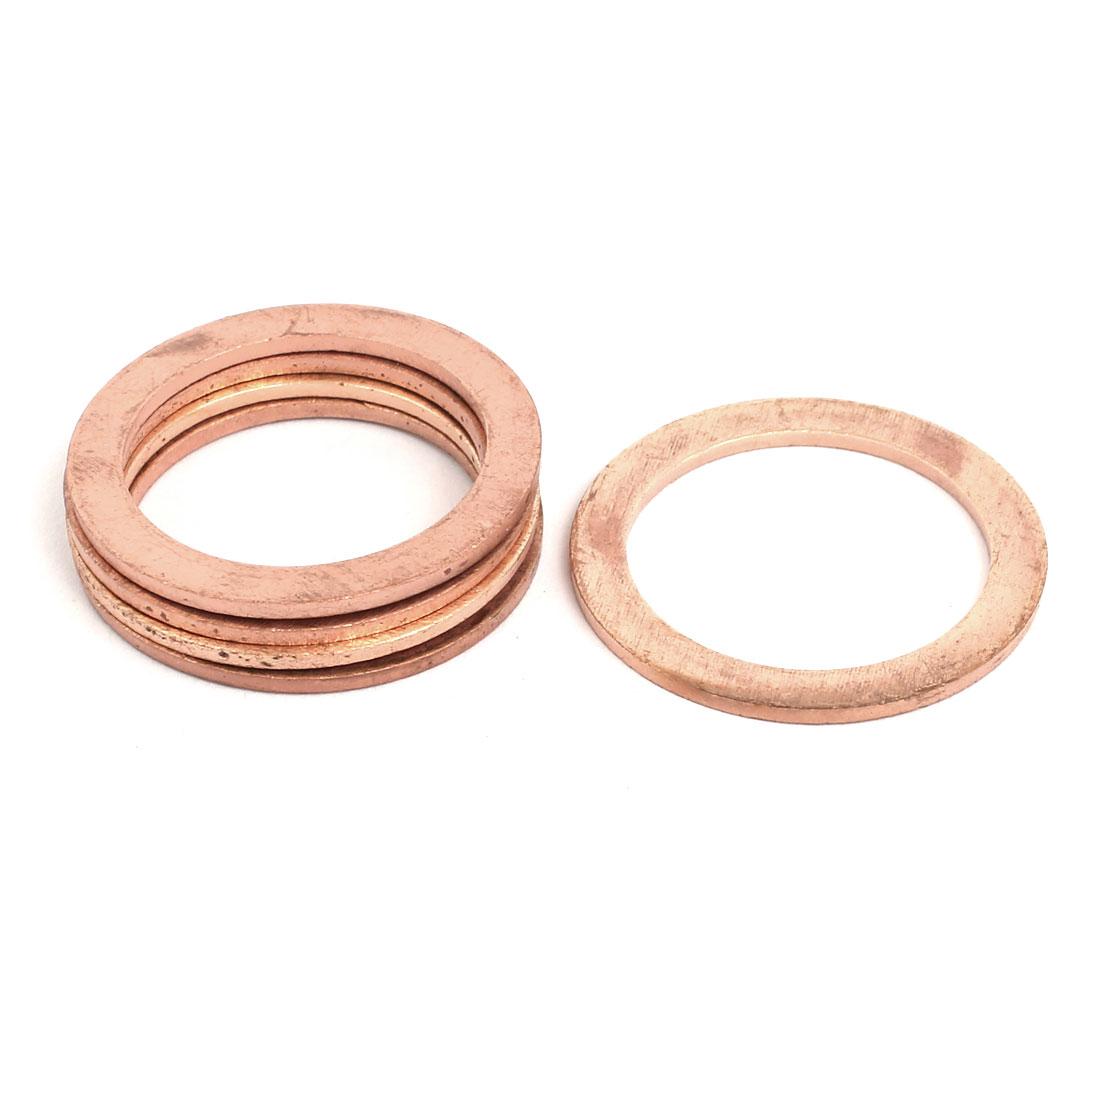 5pcs 24mmx32mmx1.5mm Copper Flat Ring Sealing Crush Washer Gasket